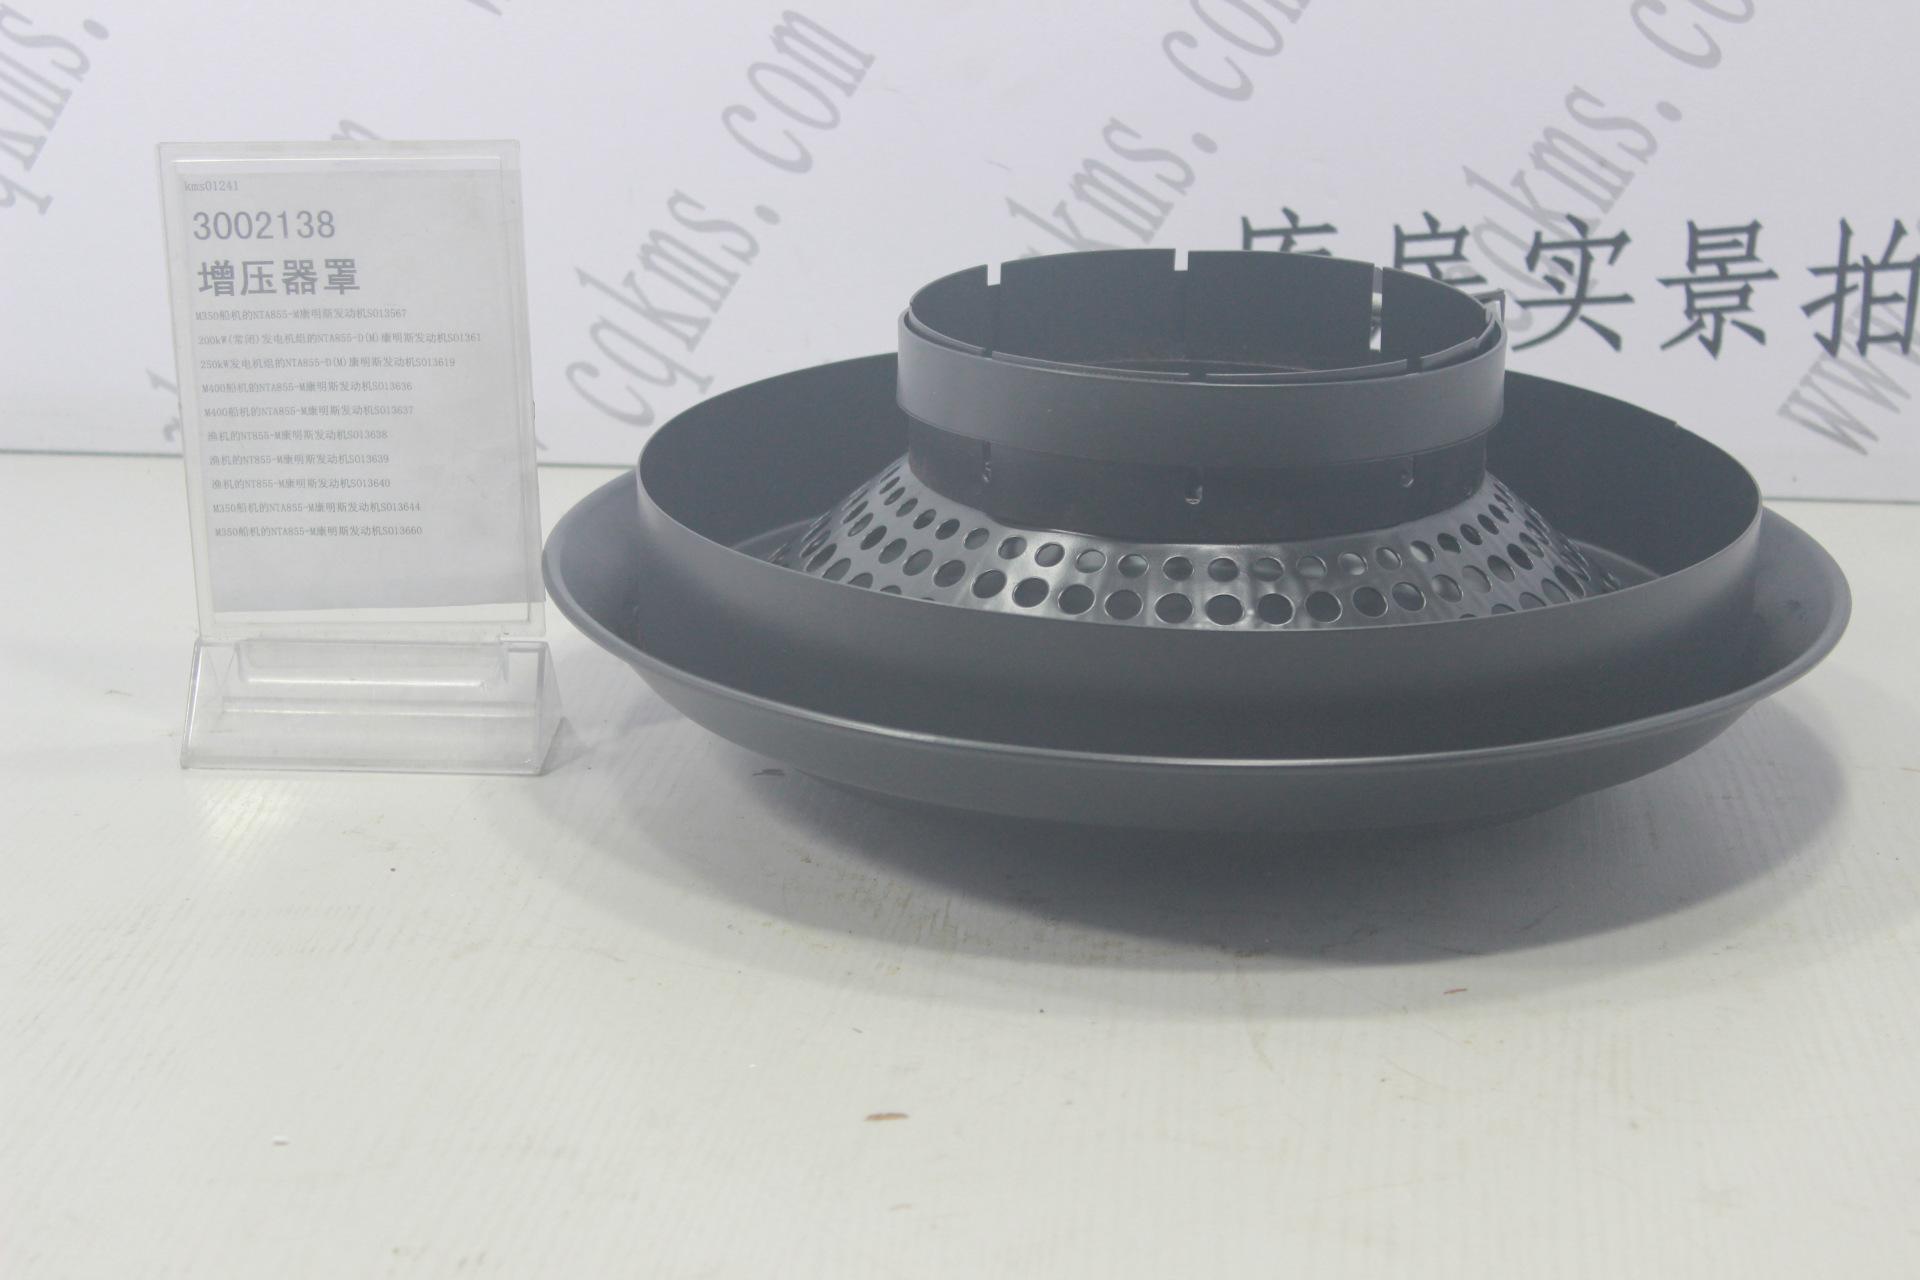 kms01241-3002138-增压器罩----参考重量500-500图片3